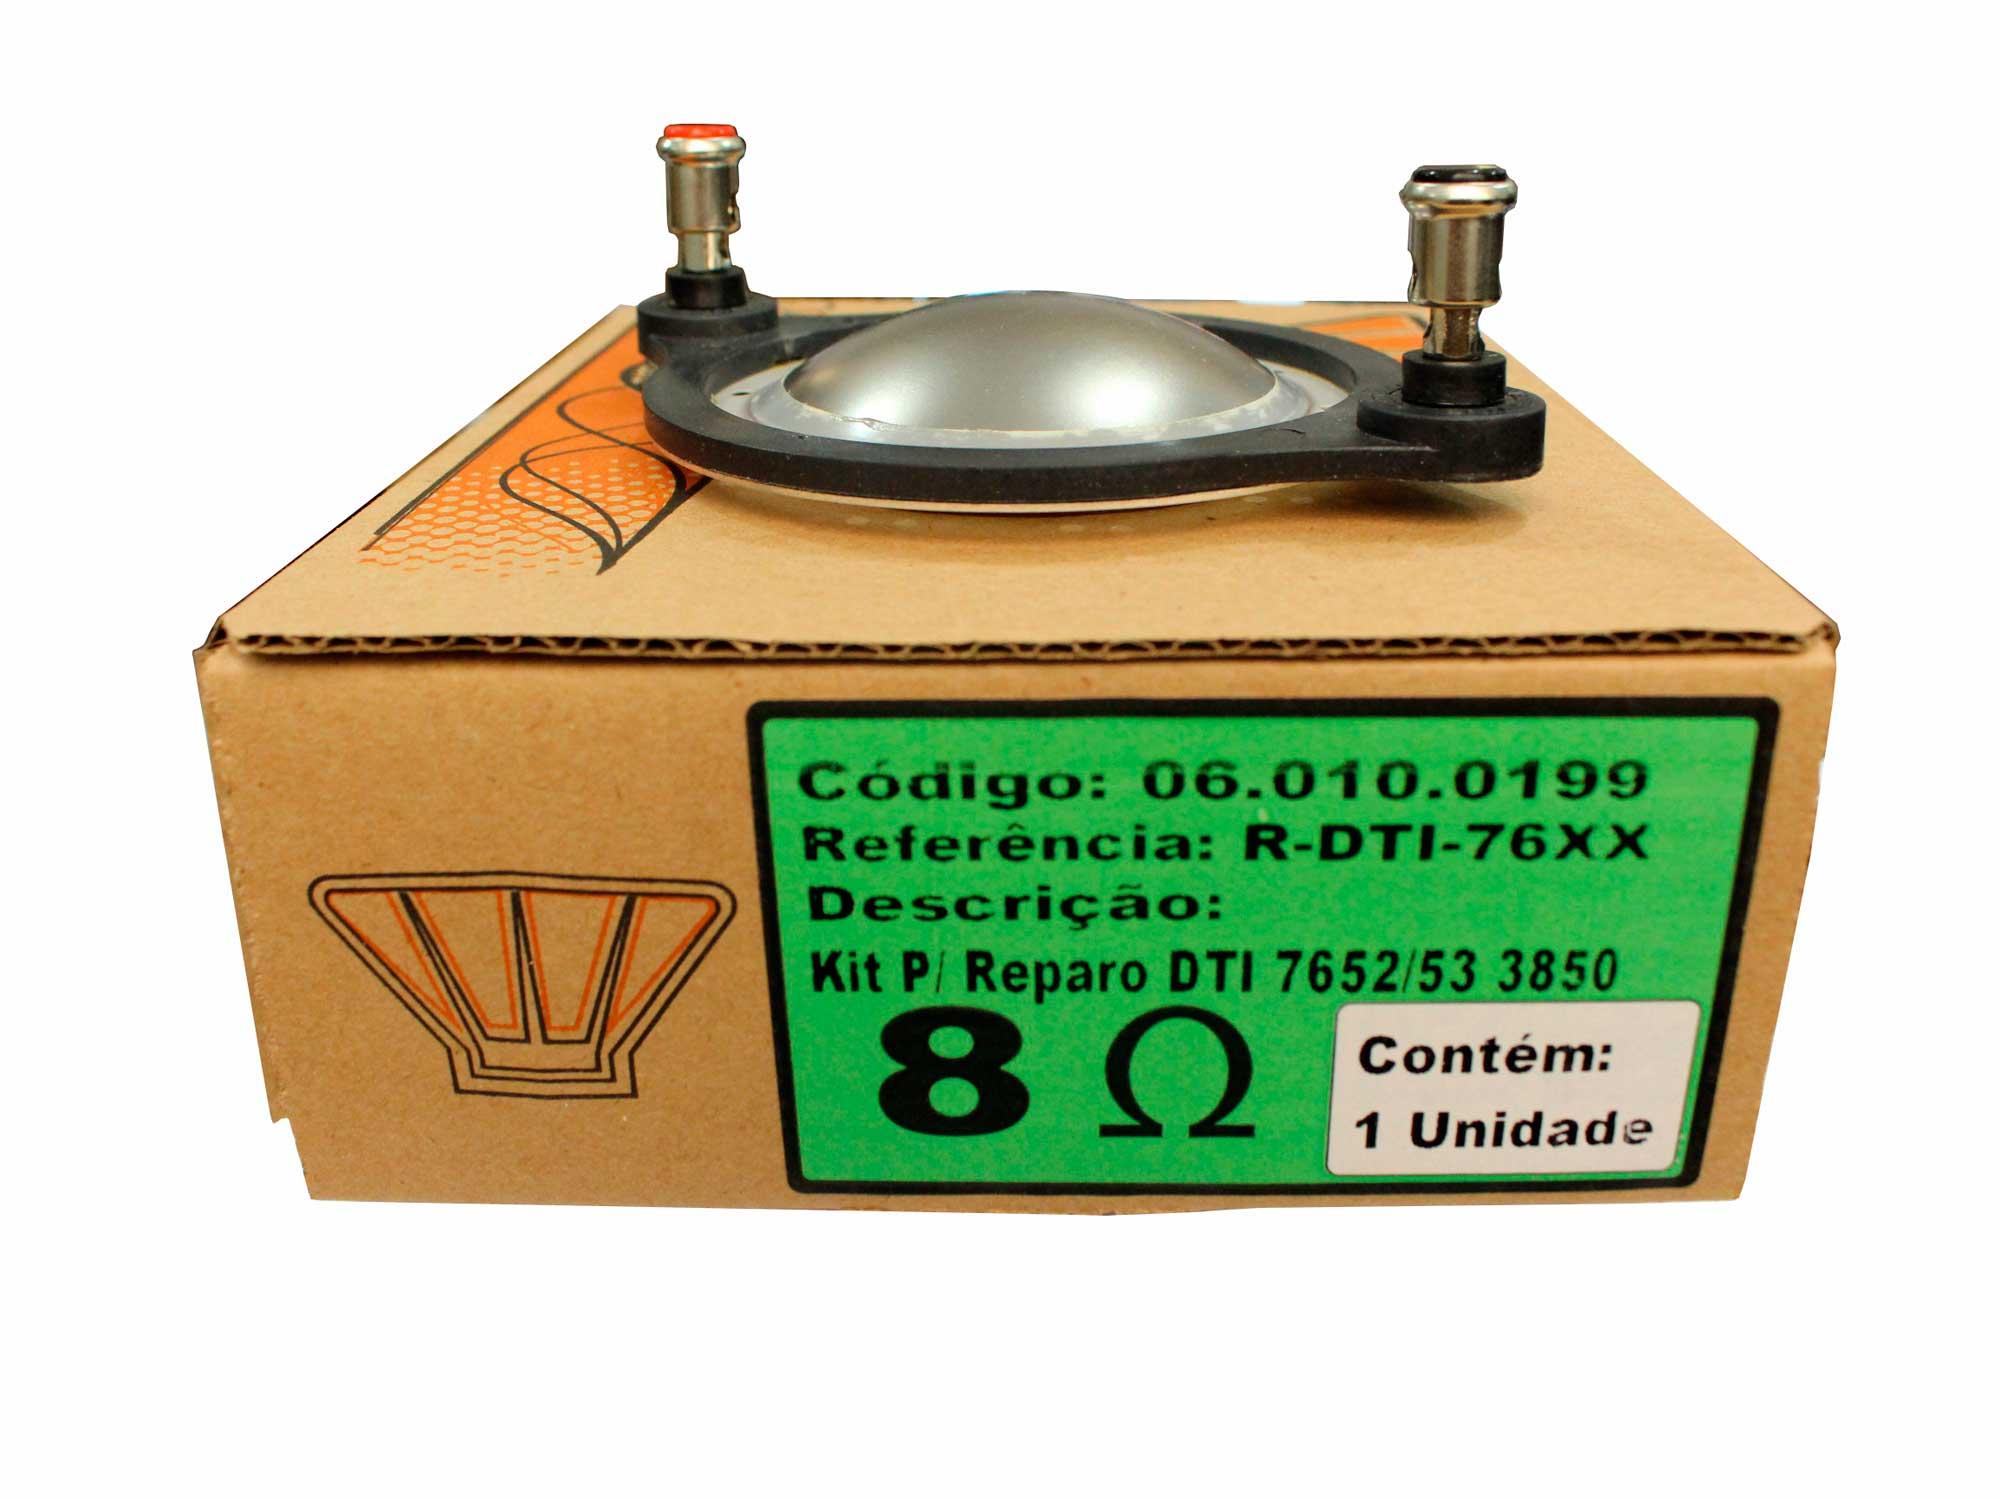 Reparo para Driver DTI 7652, 7653, 3850 em 8 ohms | Oversound | R-DTI-76XX